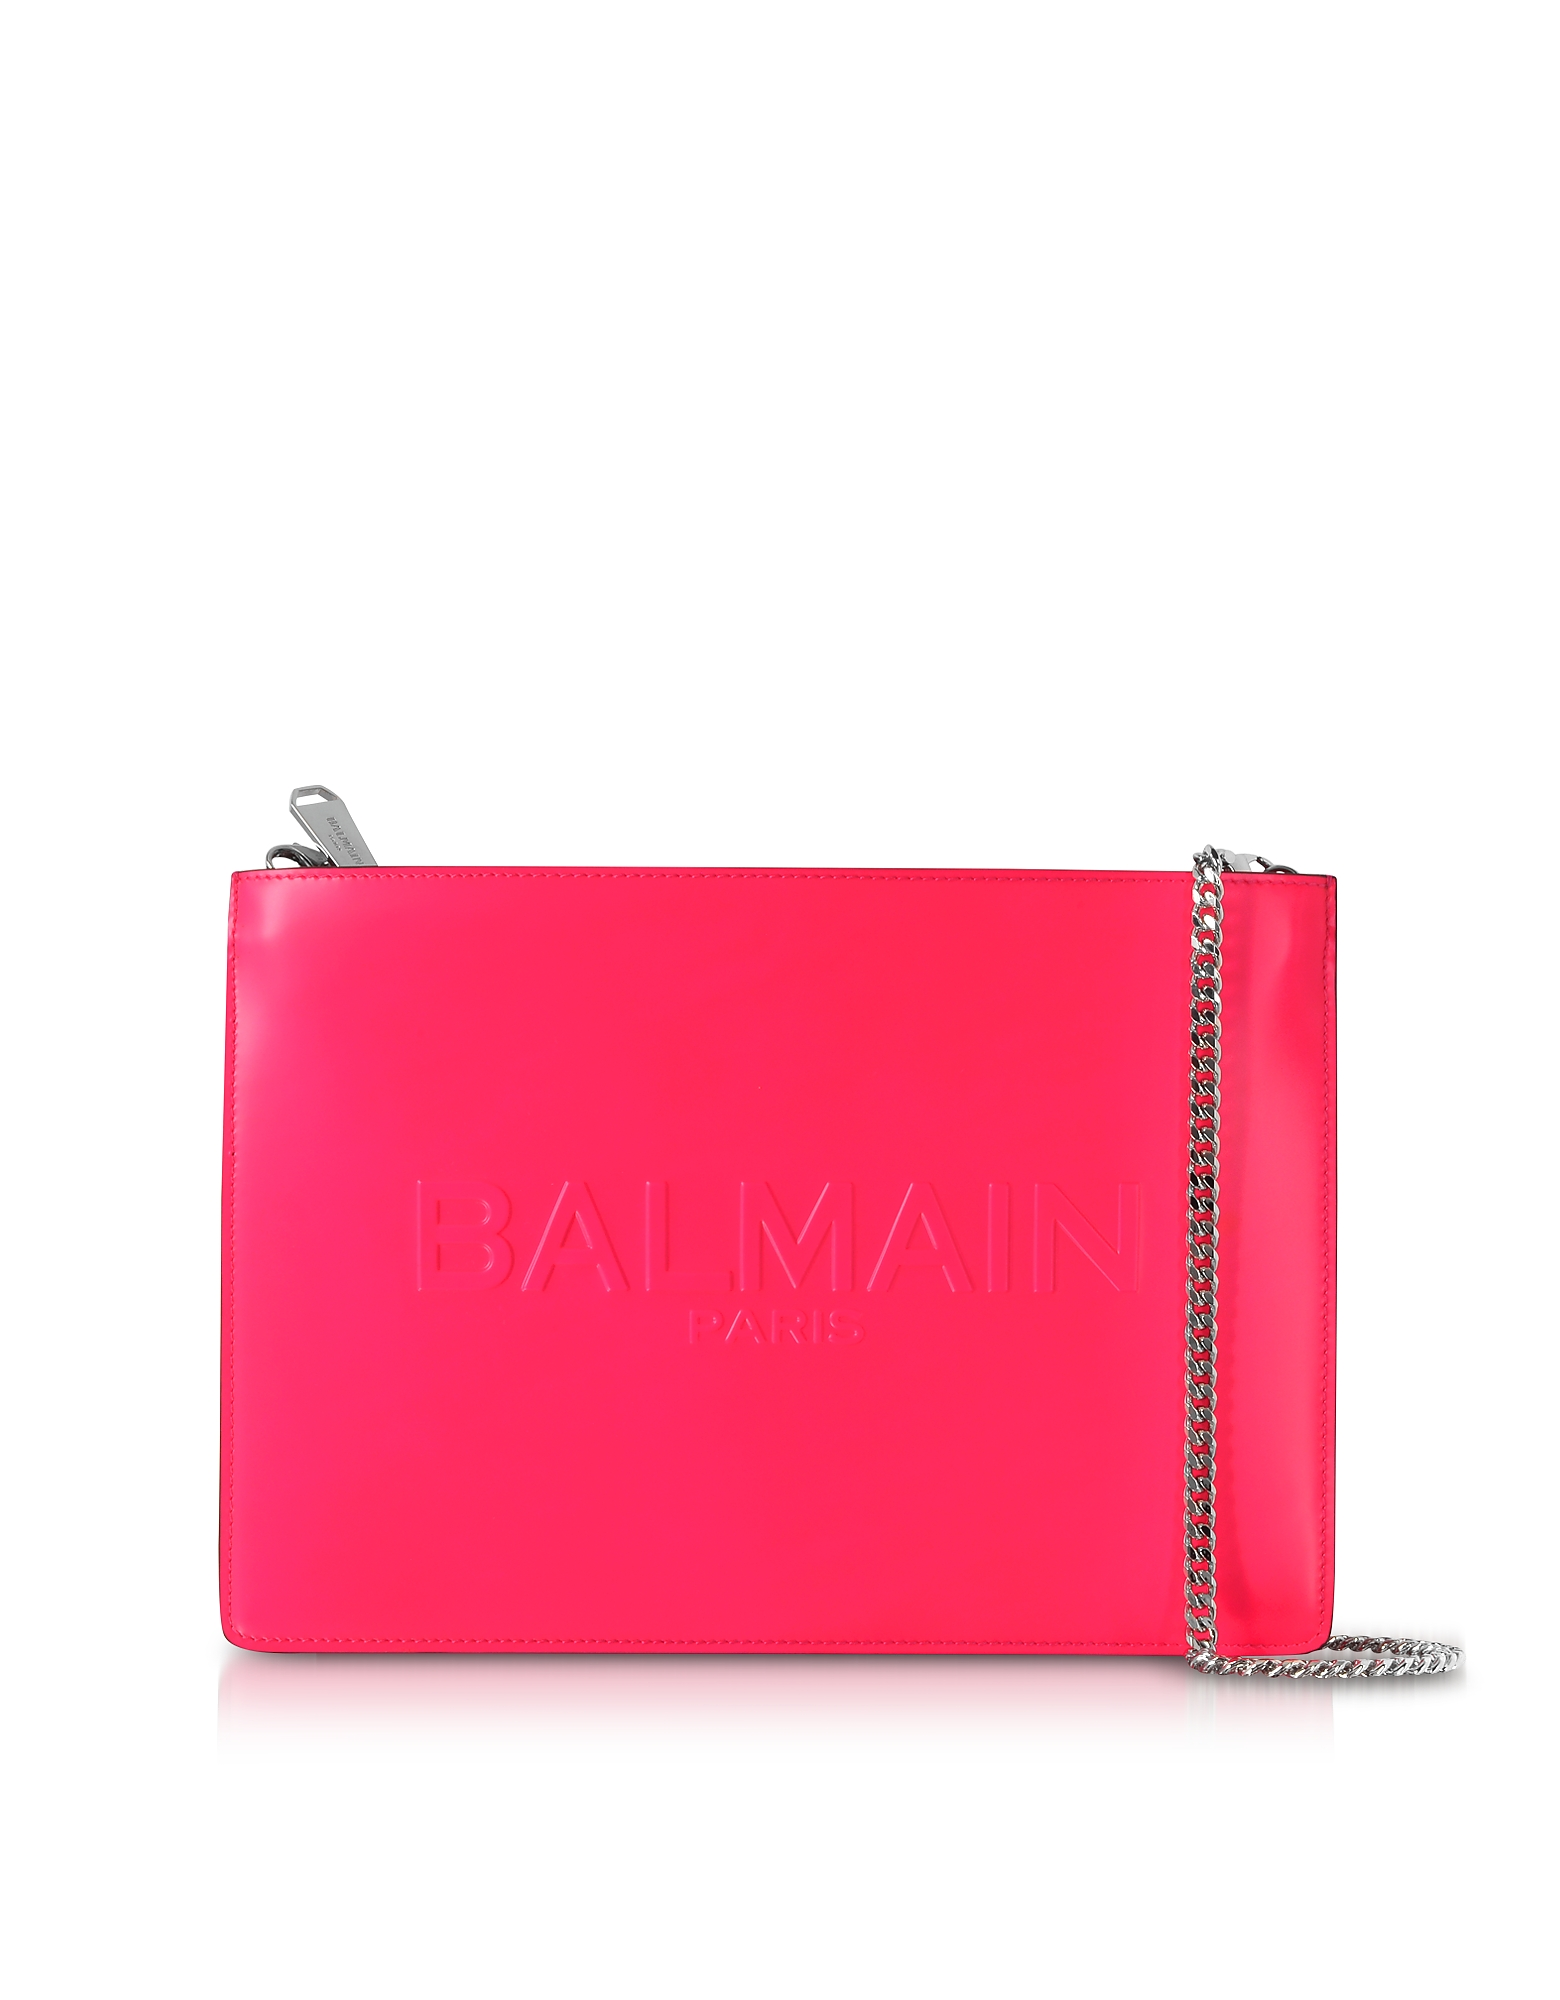 Balmain Handbags, Neon Fuchsia Shiny Leather Domaine Clutch w/Embossed Logo